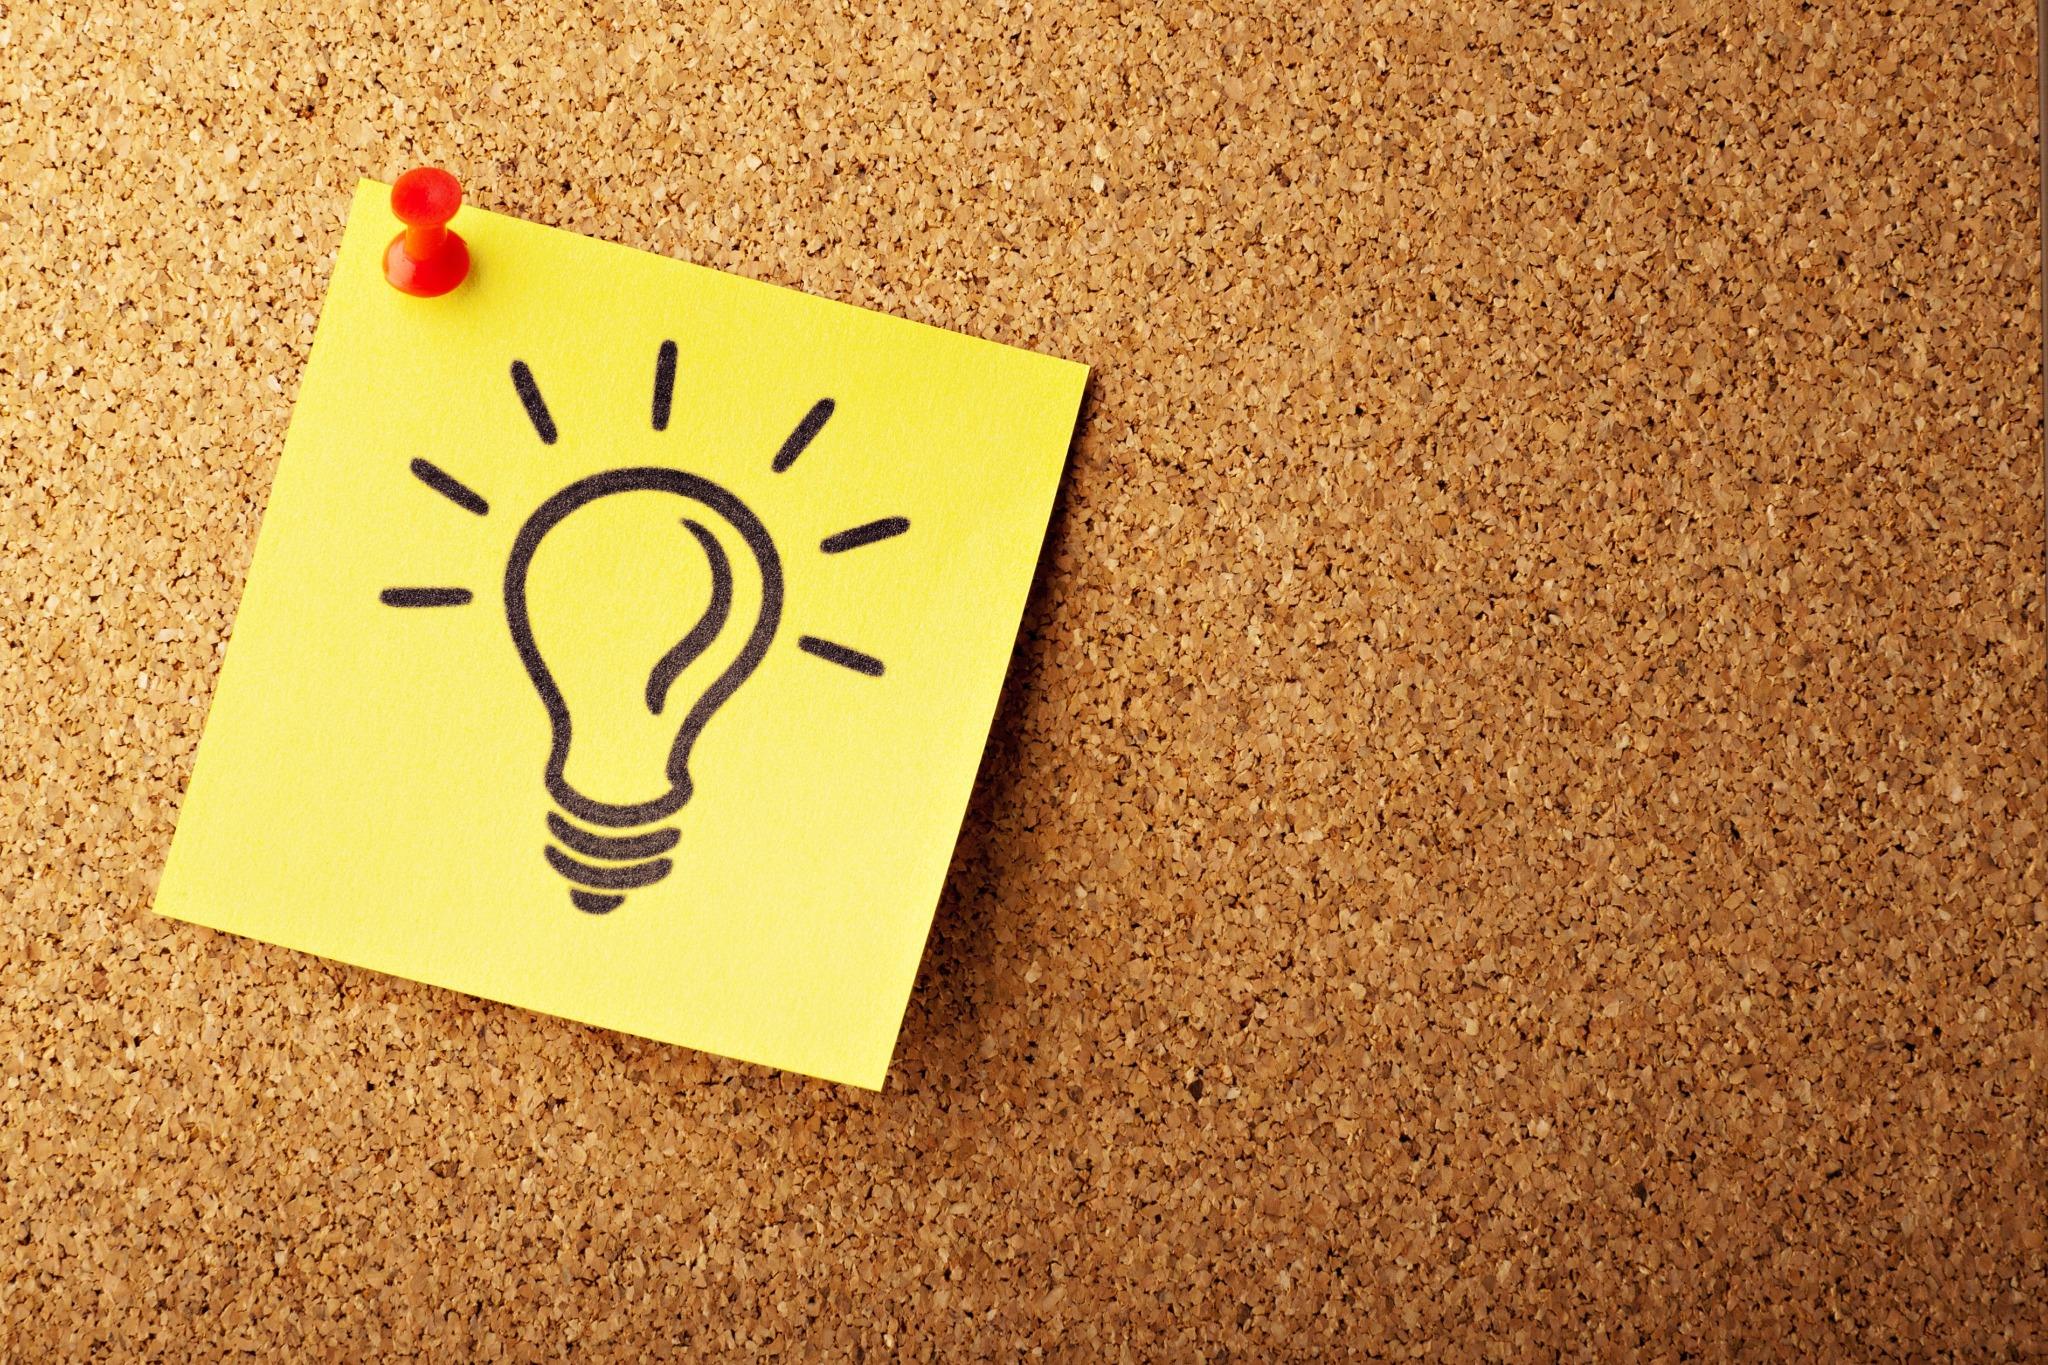 lightbulb drawing pin board idea epiphany